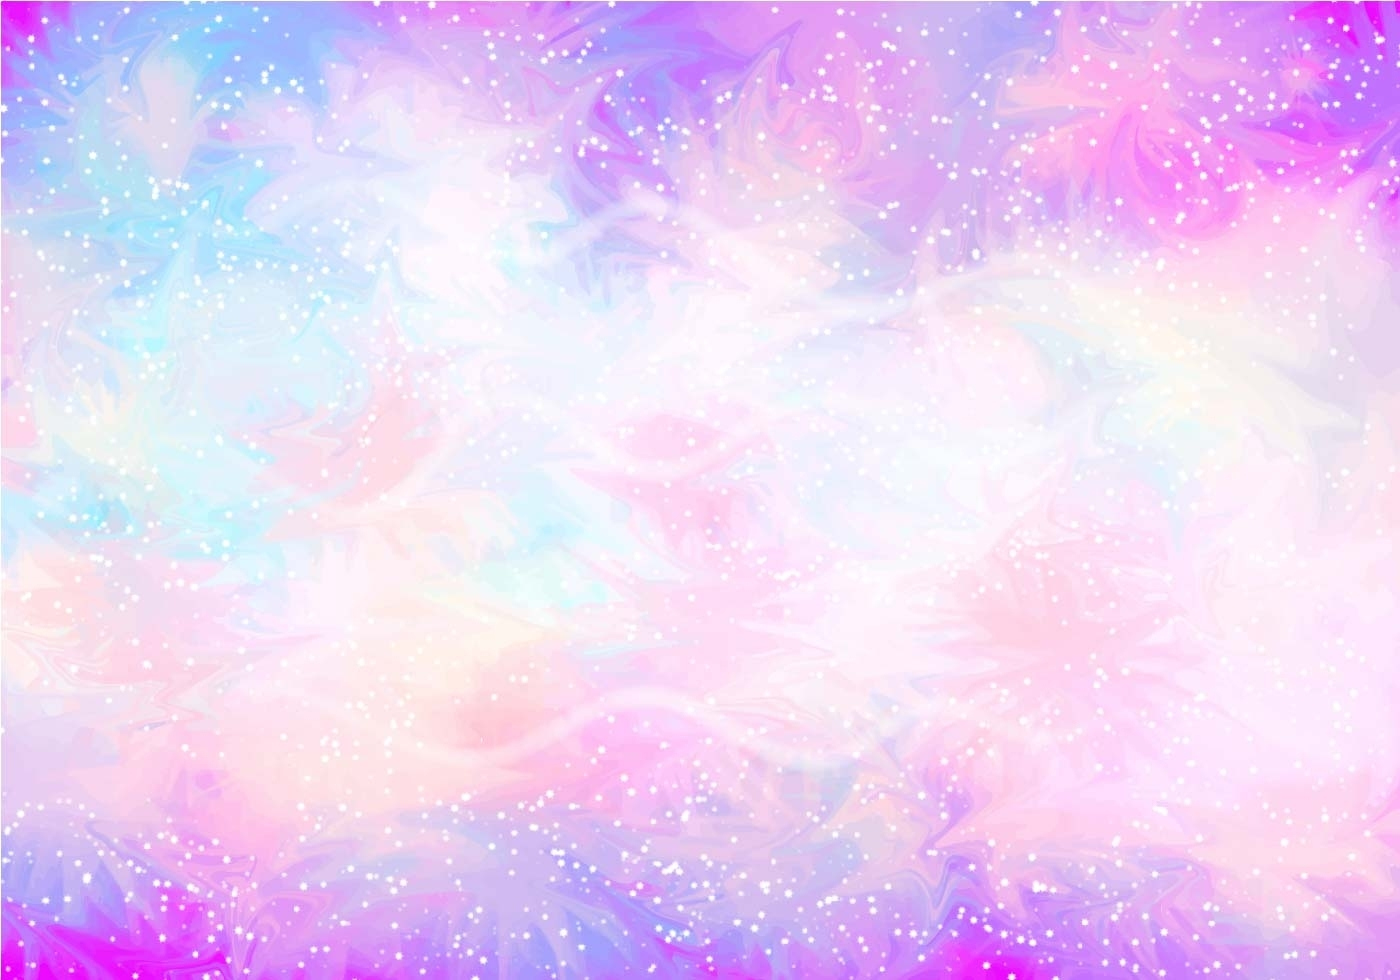 light purple background design - (38351 free downloads)